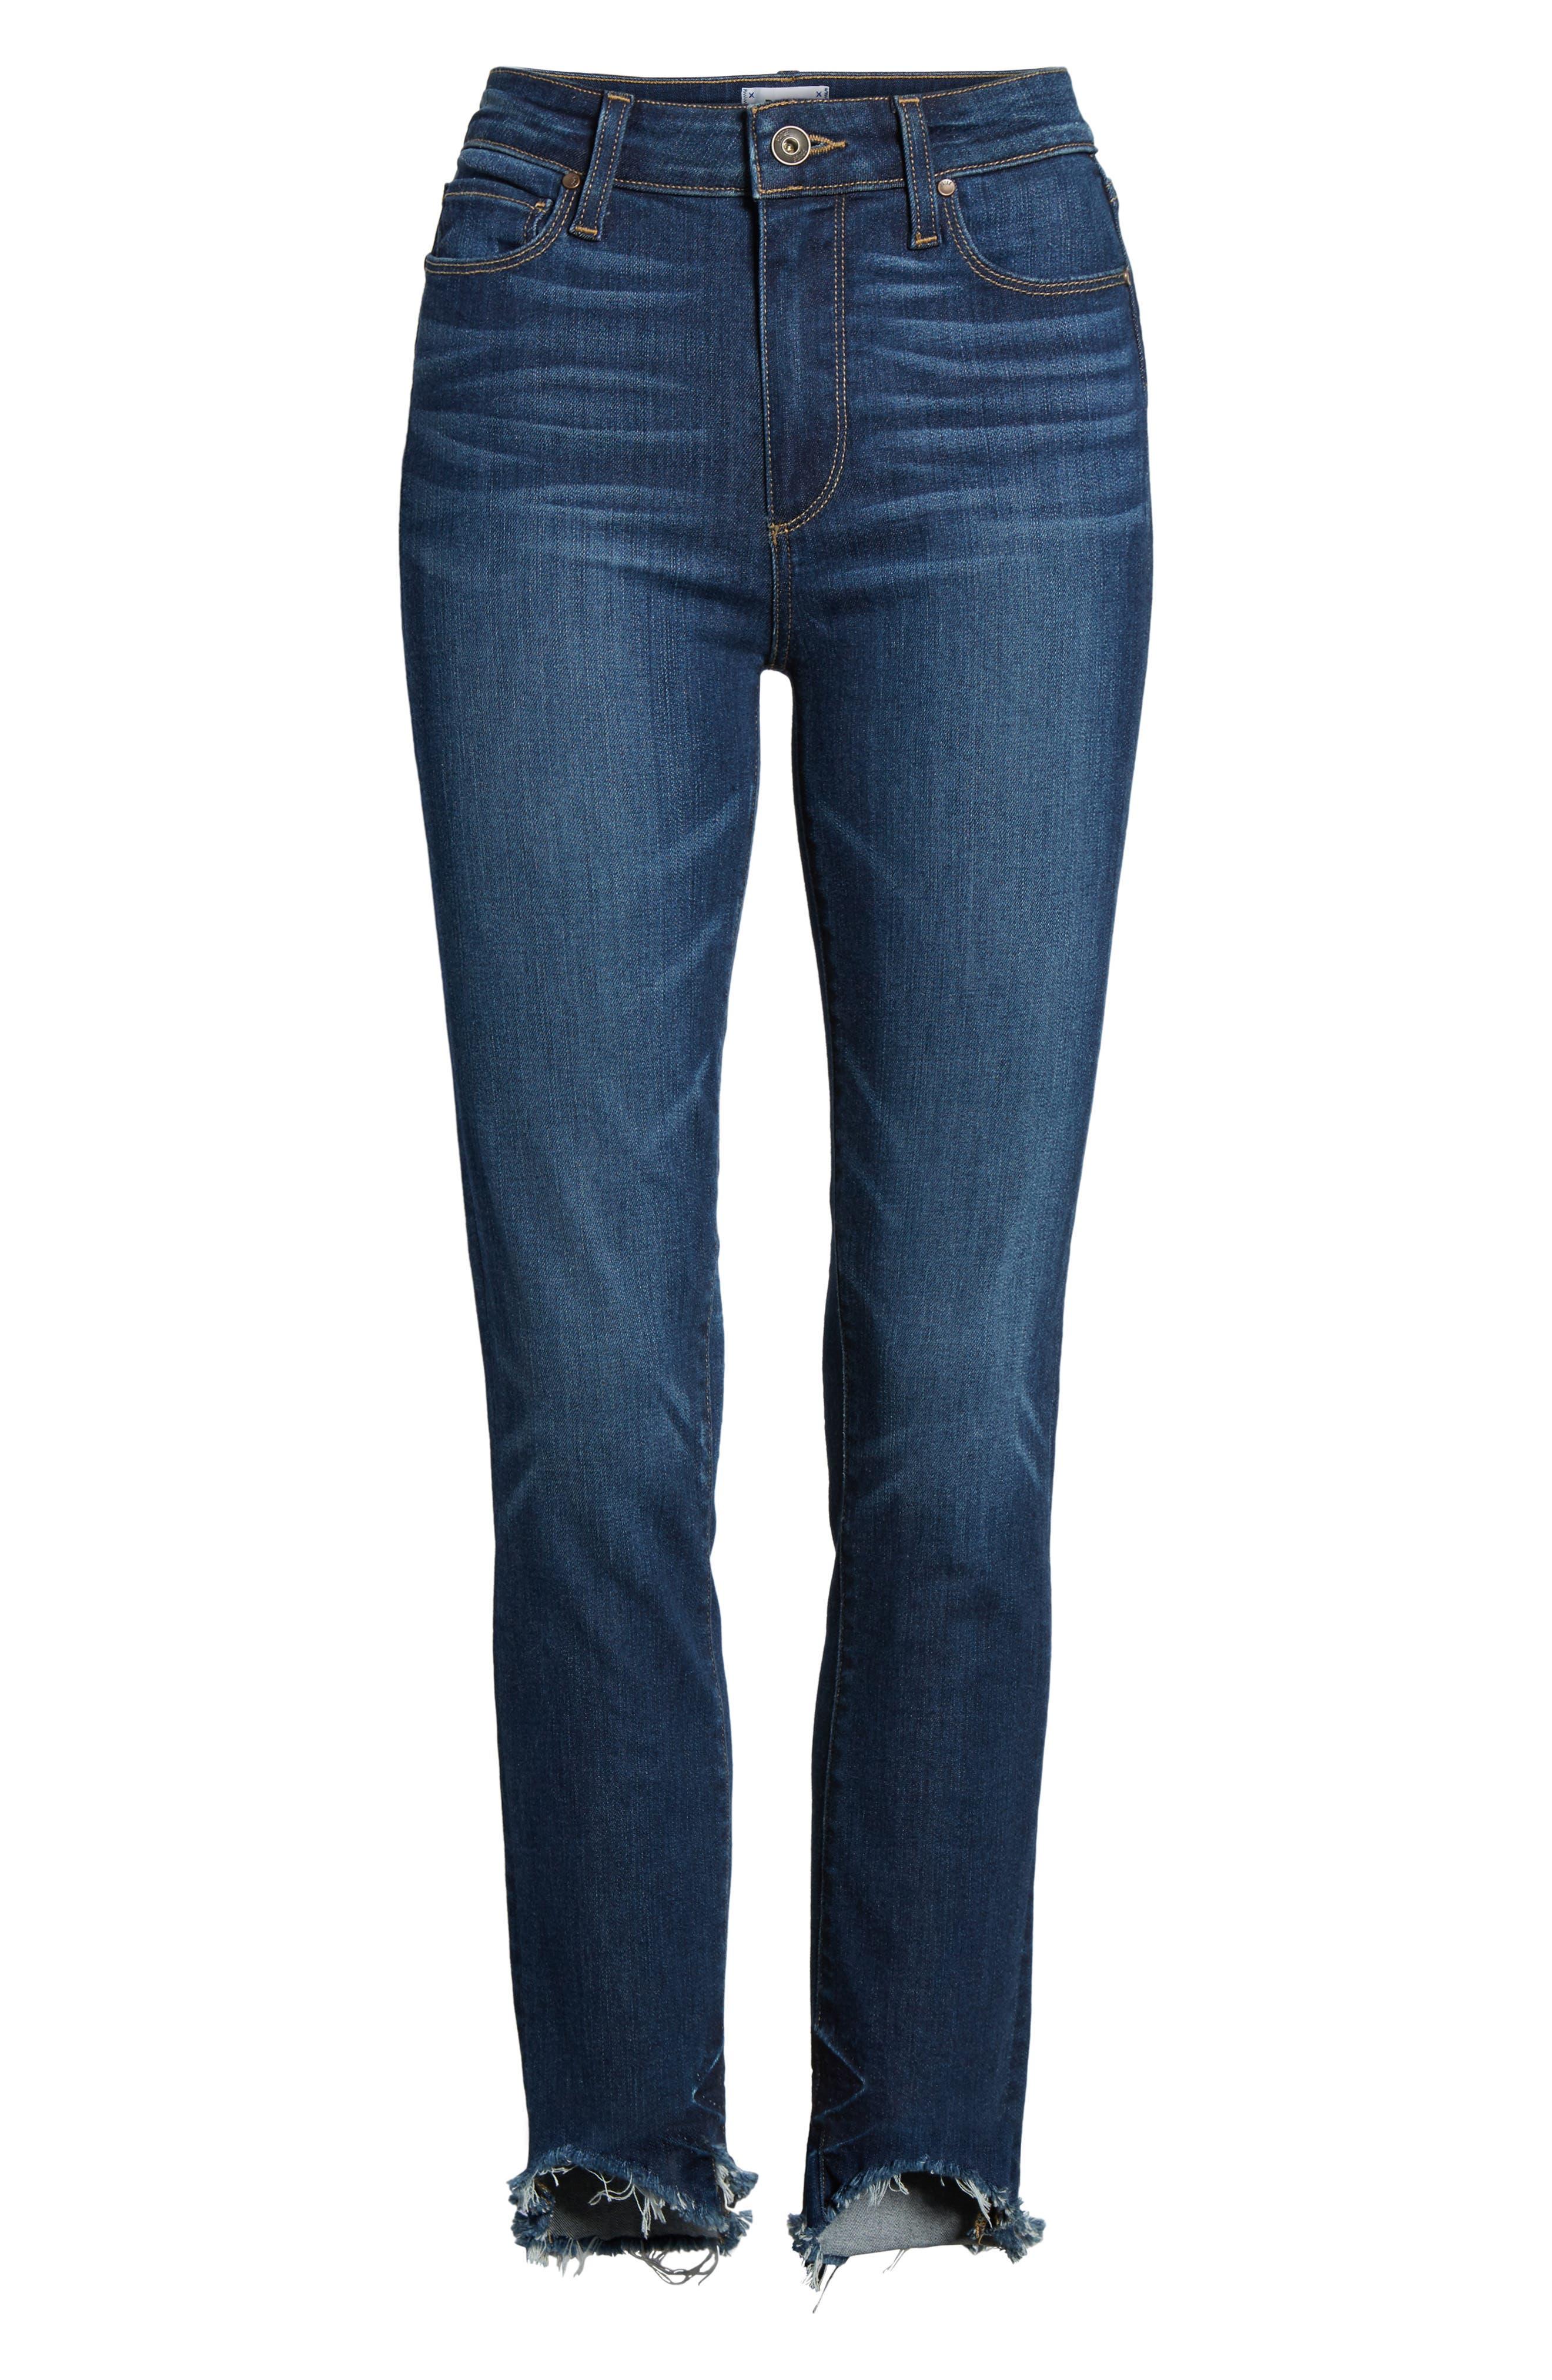 Transcend Vintage - Hoxton High Waist Ankle Skinny Jeans,                             Alternate thumbnail 6, color,                             400